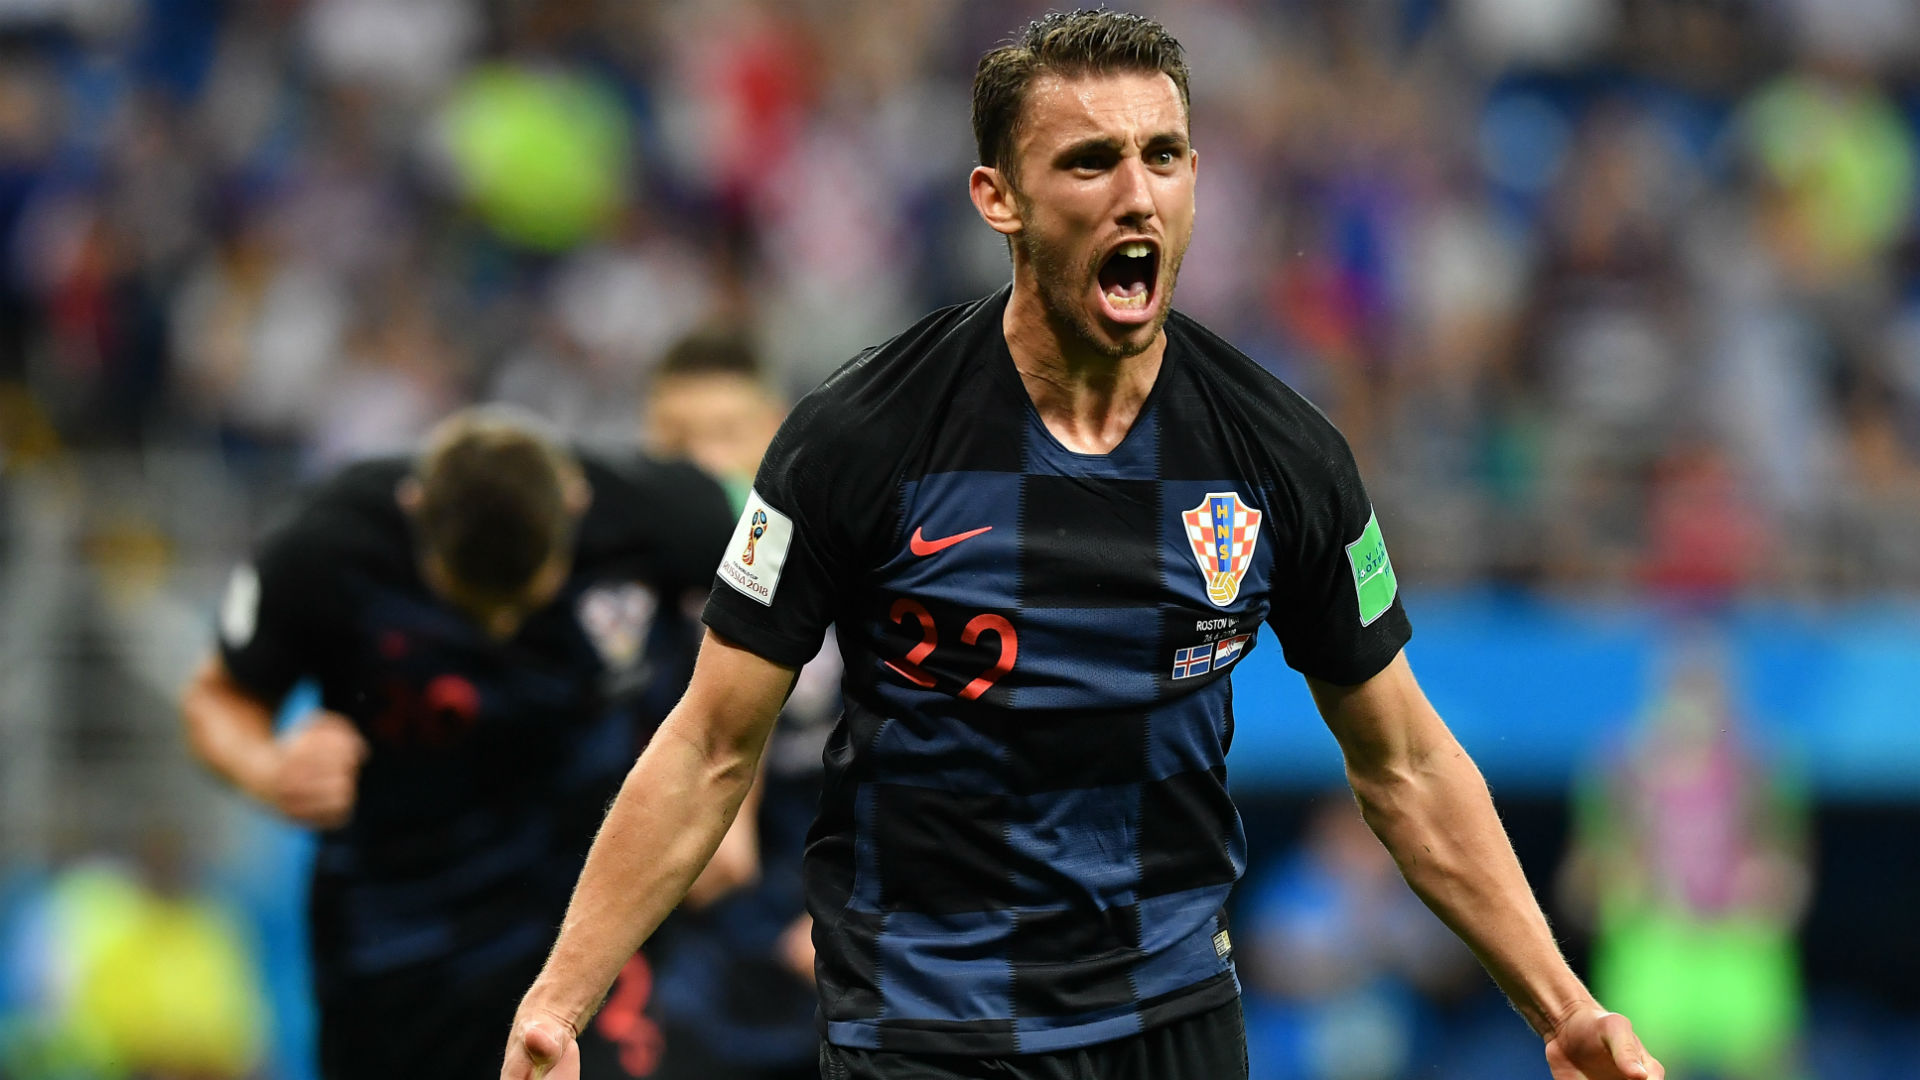 croatia iceland - josip pivaric - world cup - 26062018